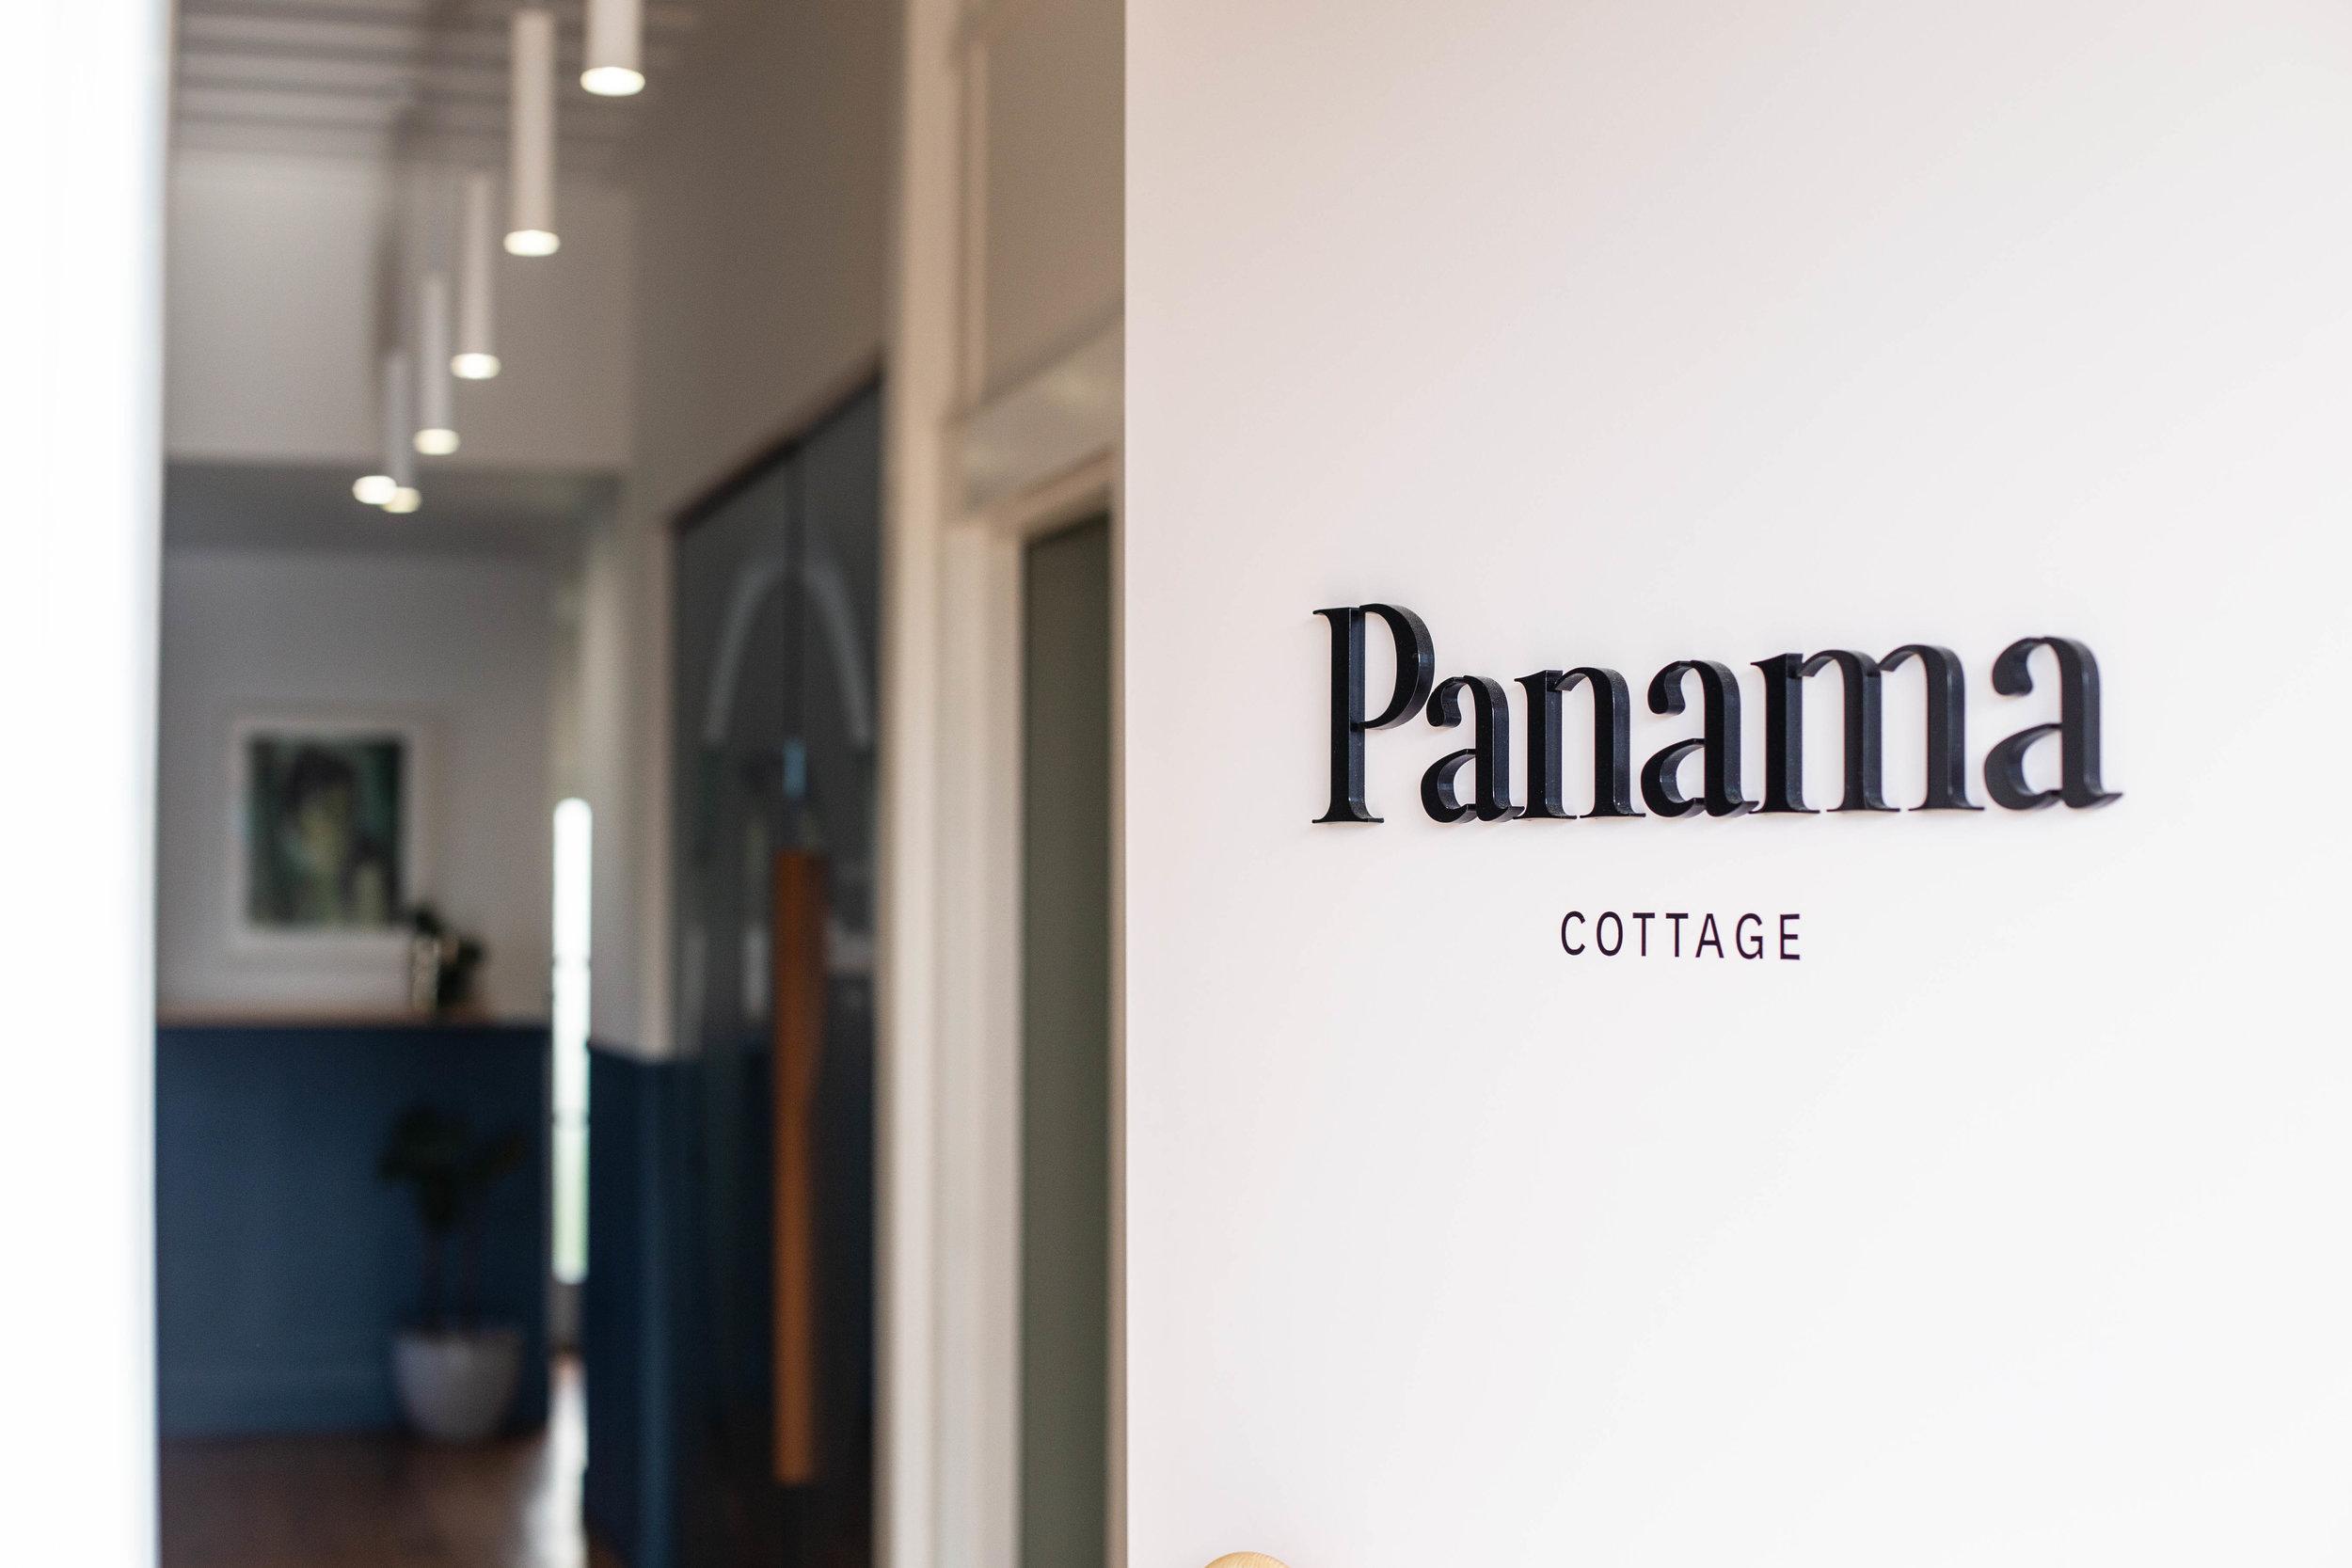 Panama Cottage